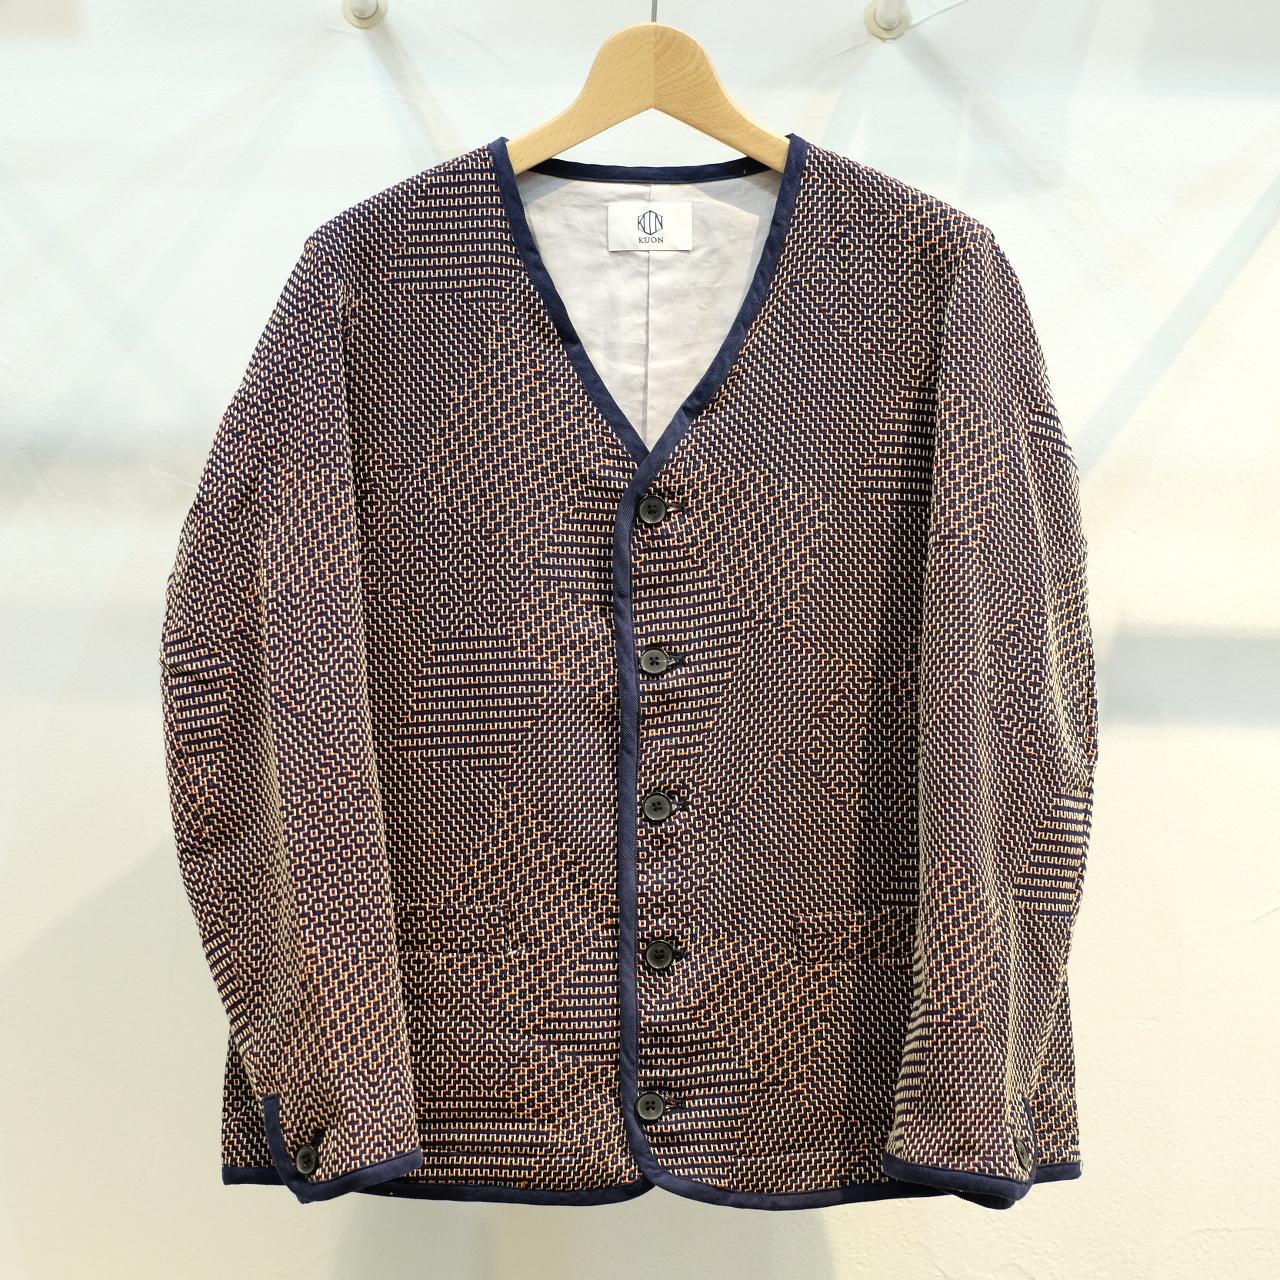 KUON(クオン) 新紋刺し子織 カーディガン ネイビー